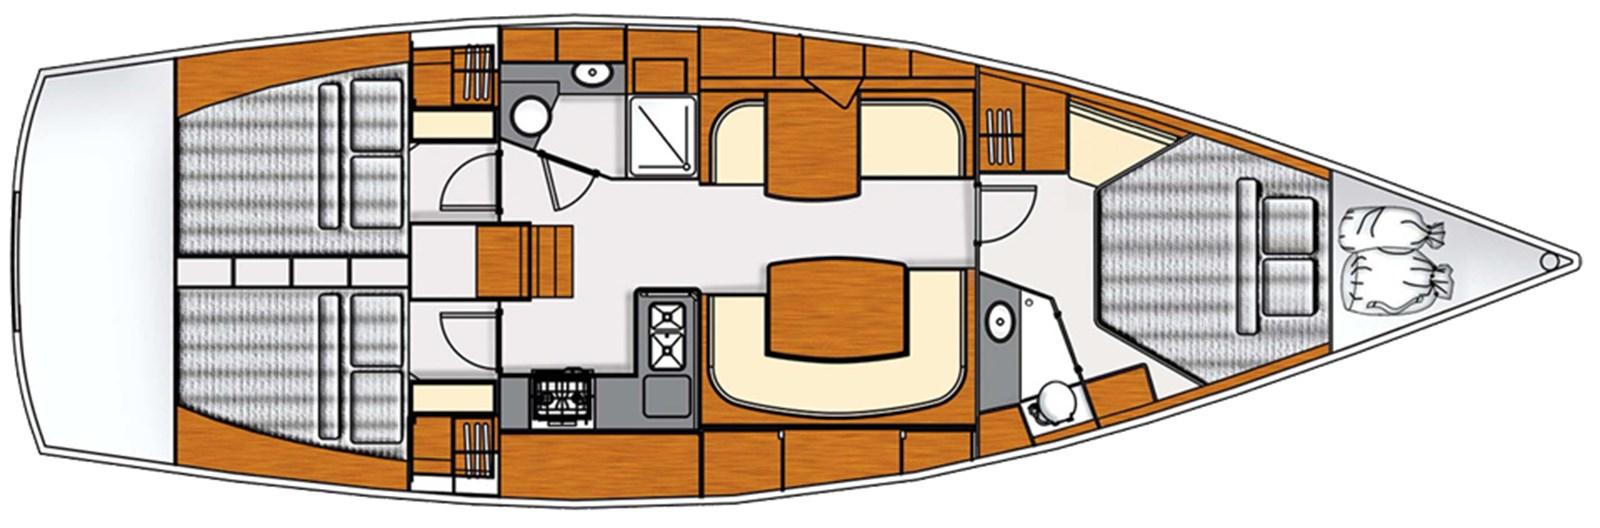 moody-45ac-layout-1 2012 MOODY Moody 45AC Cruising Sailboat 2860662